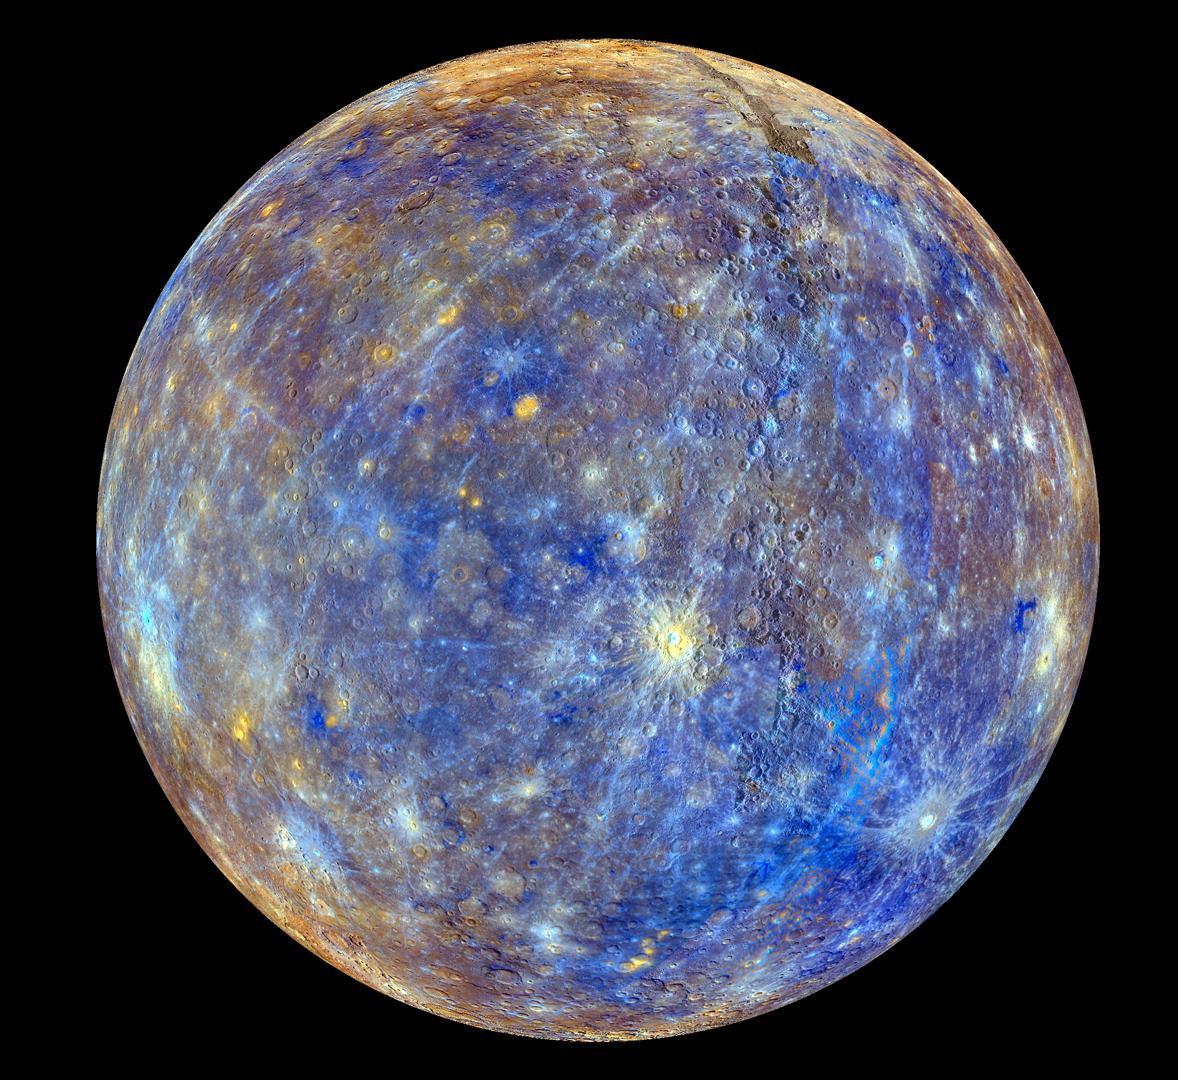 Mercury! NASA Mercury Messenger image via imgurvfA7gxI